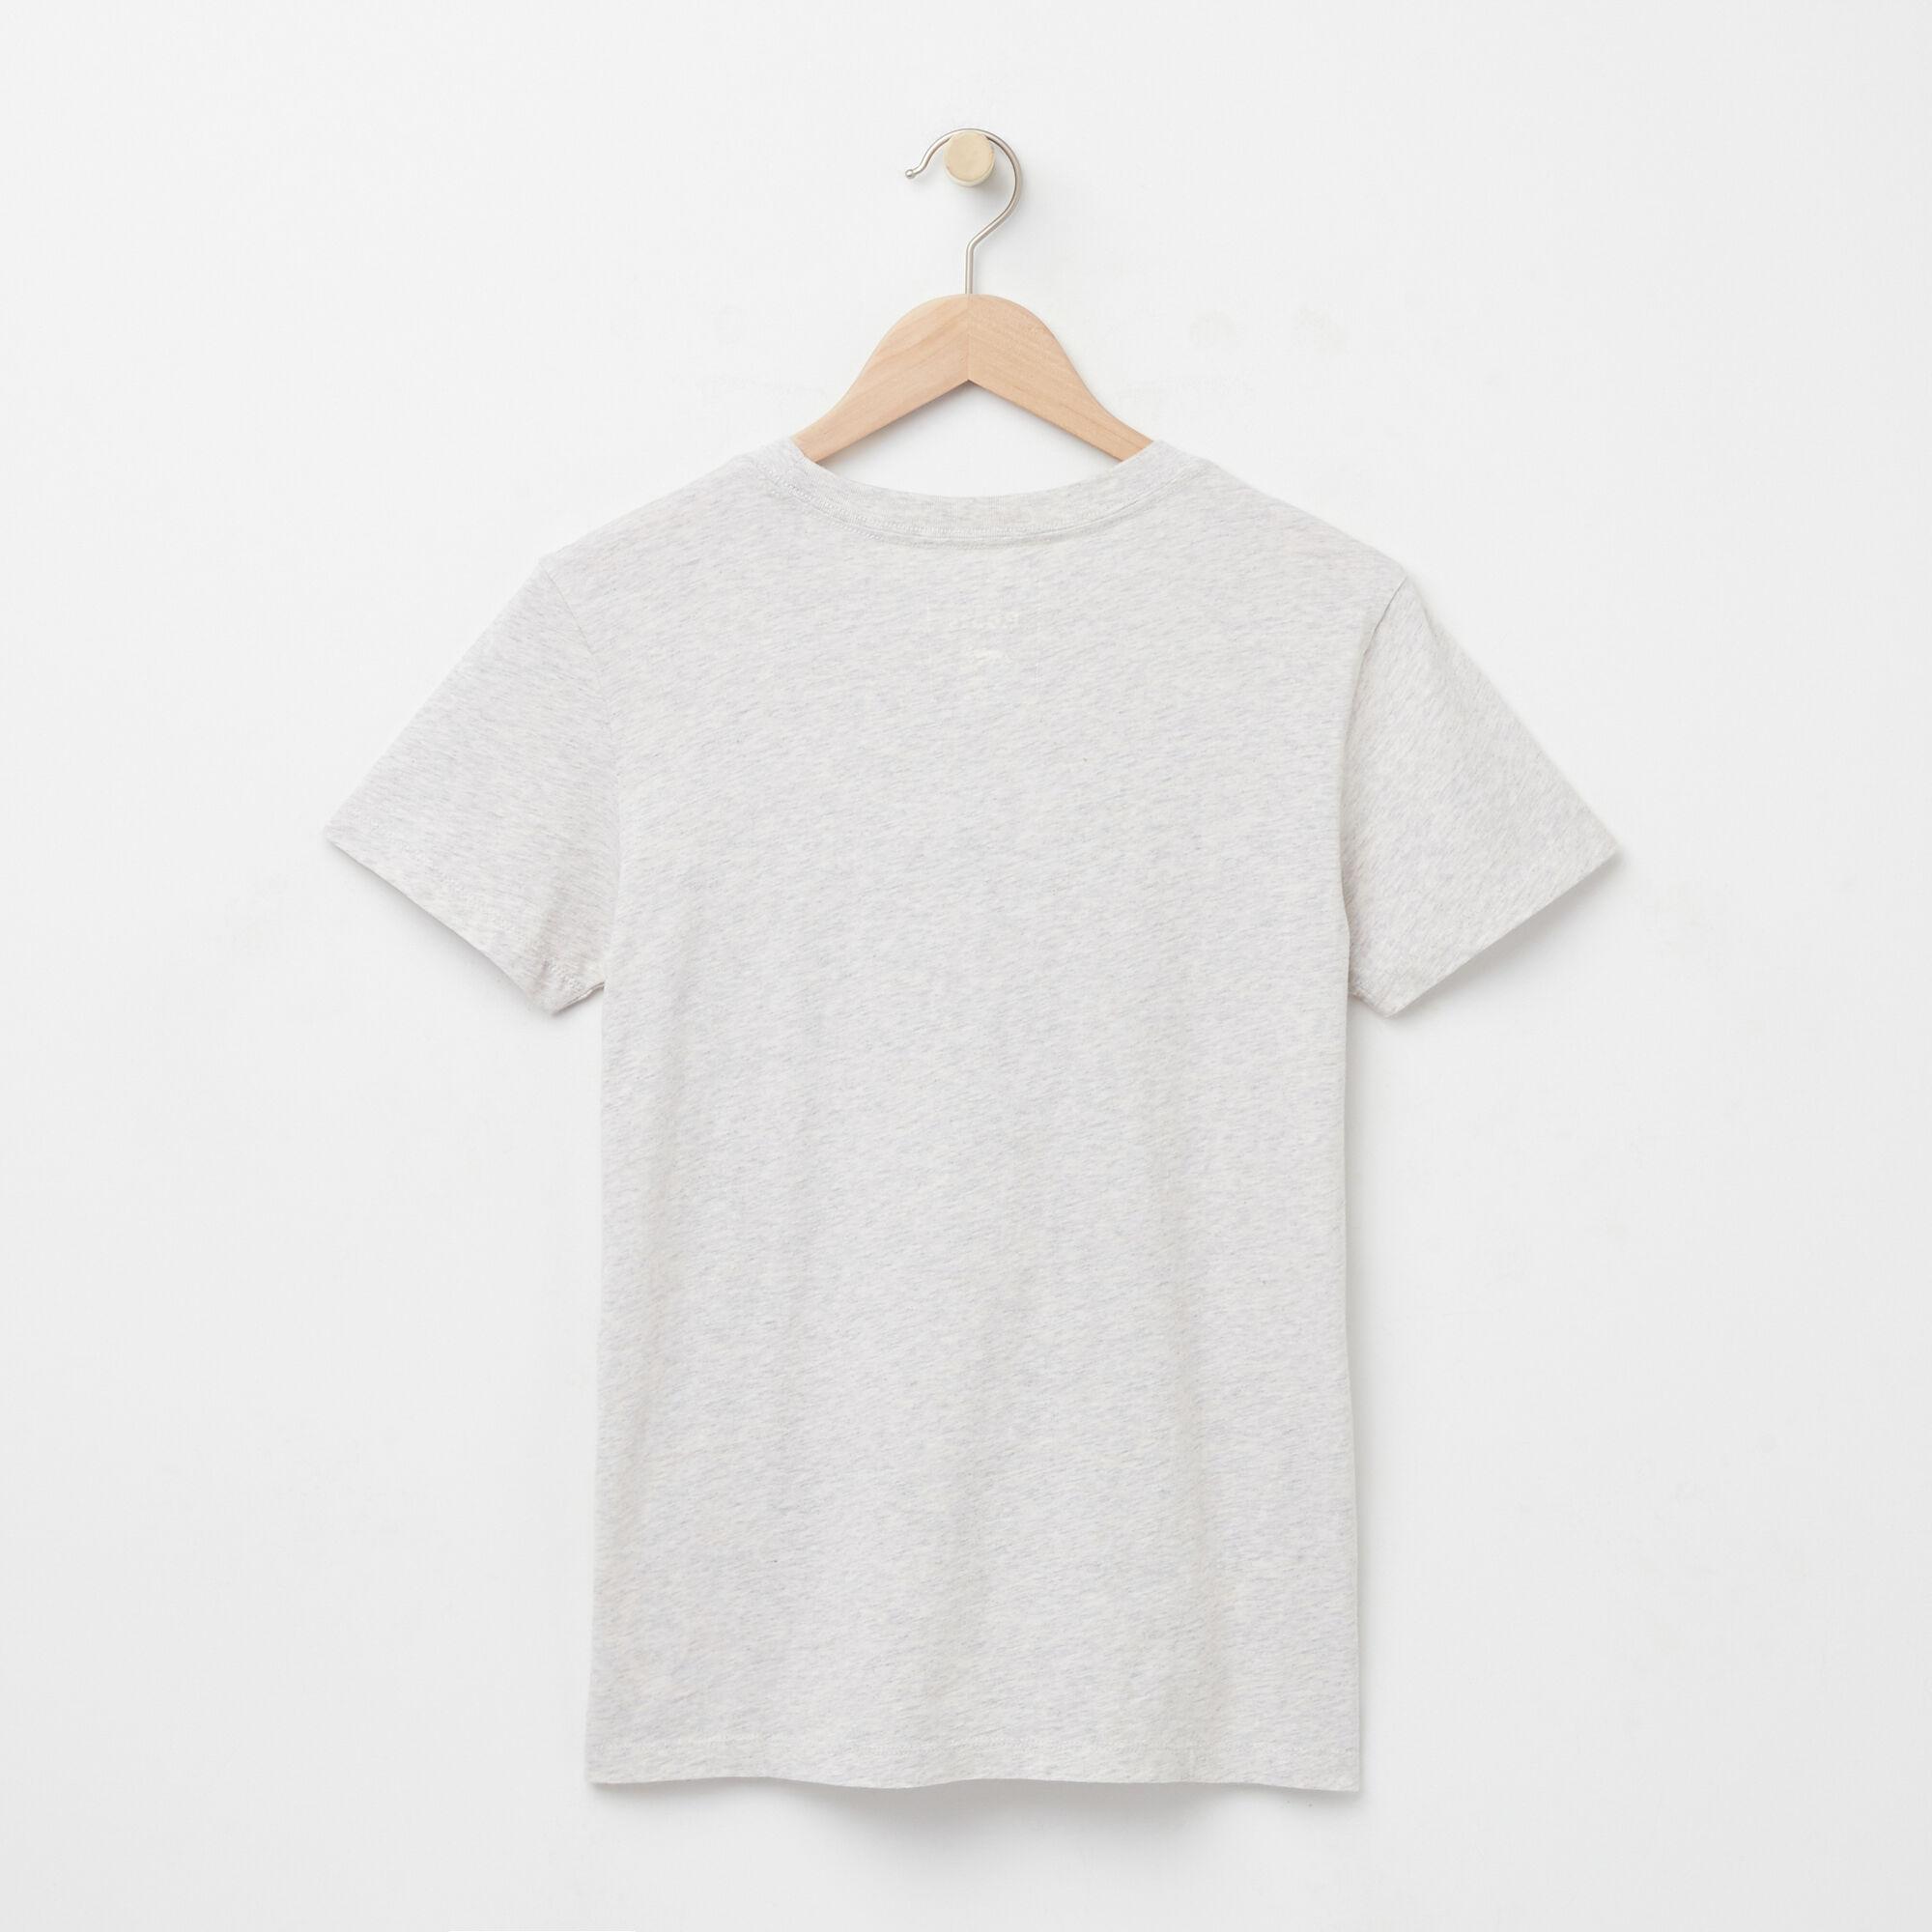 Floral Cooper T-shirt